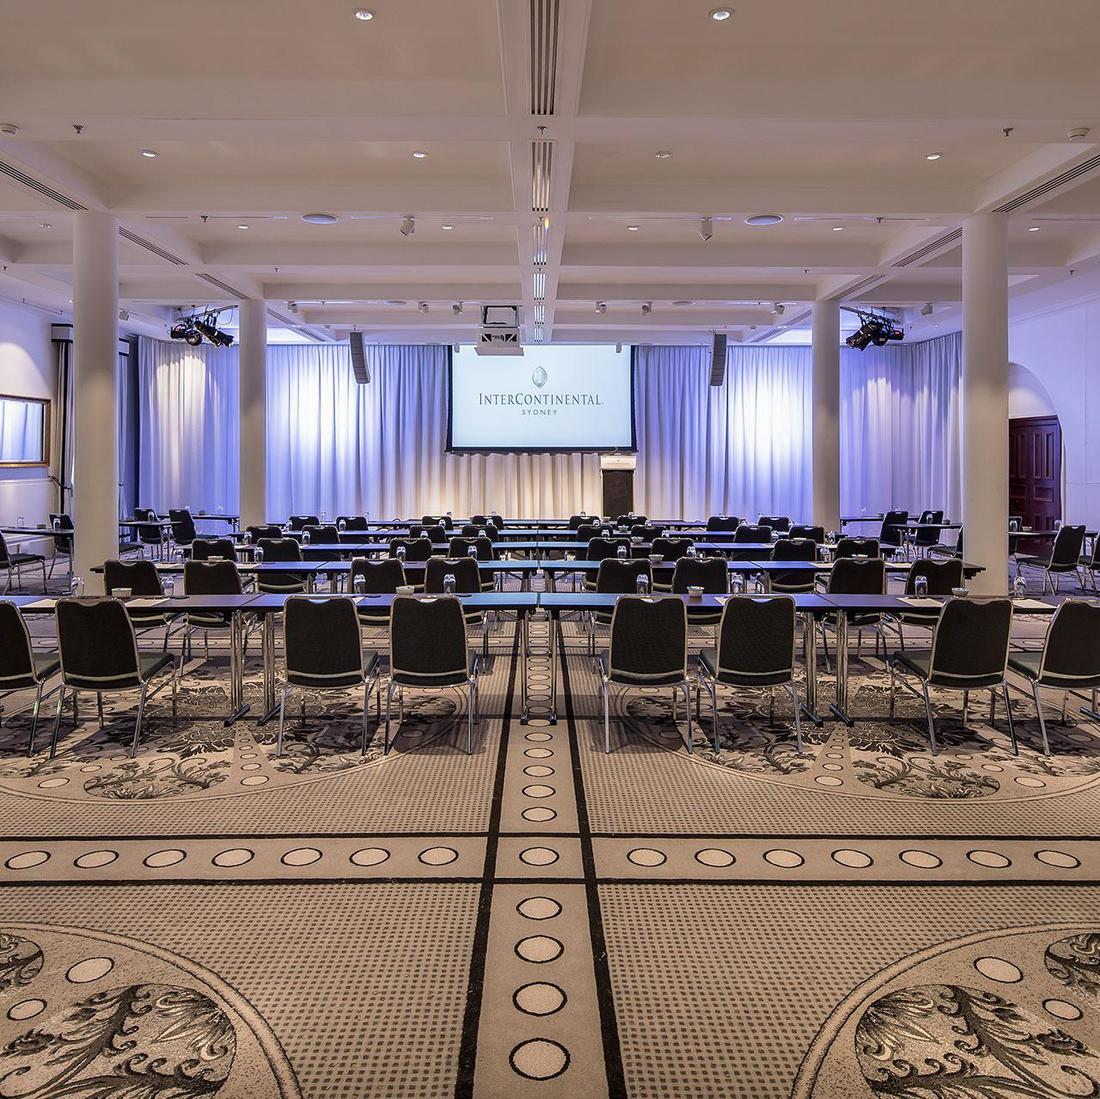 Intercontinental Sydney Brintons Carpets